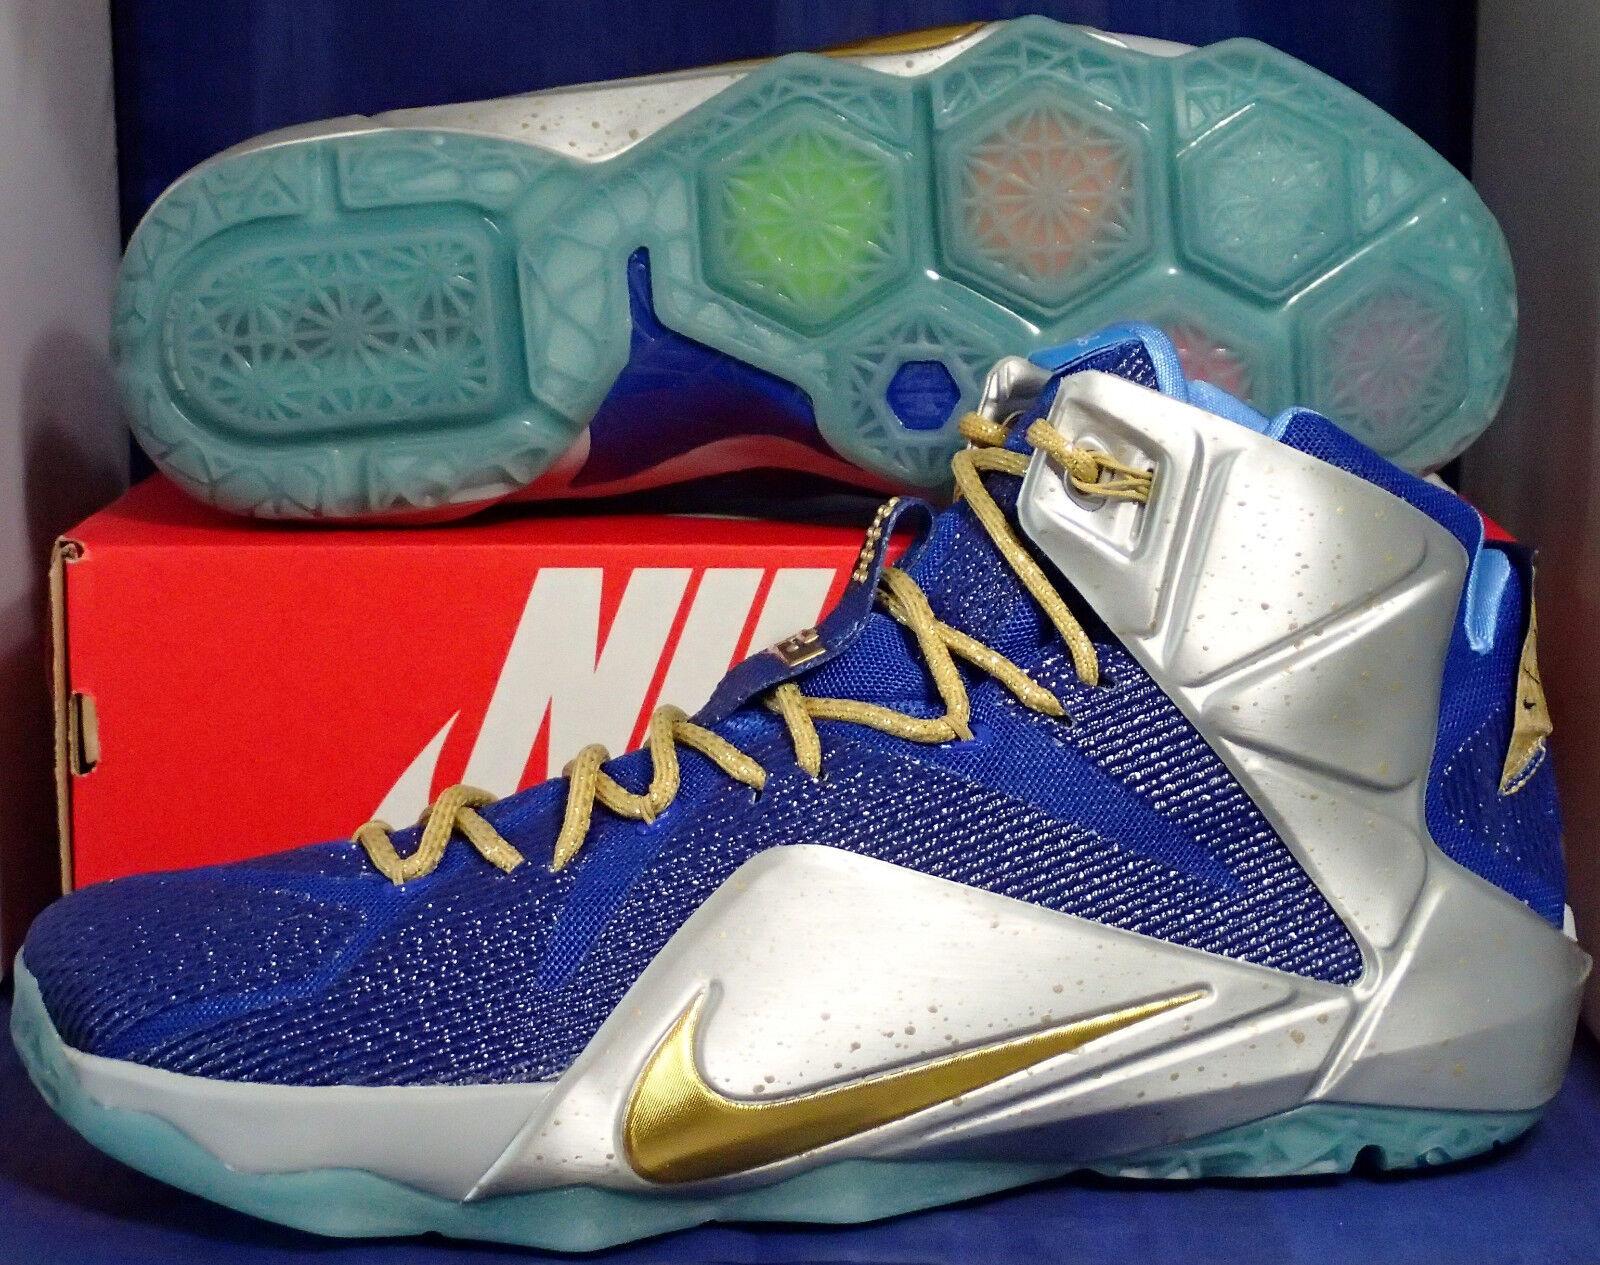 Nike lebron xii 12 id blu argento oro sz 14 (728709-982)